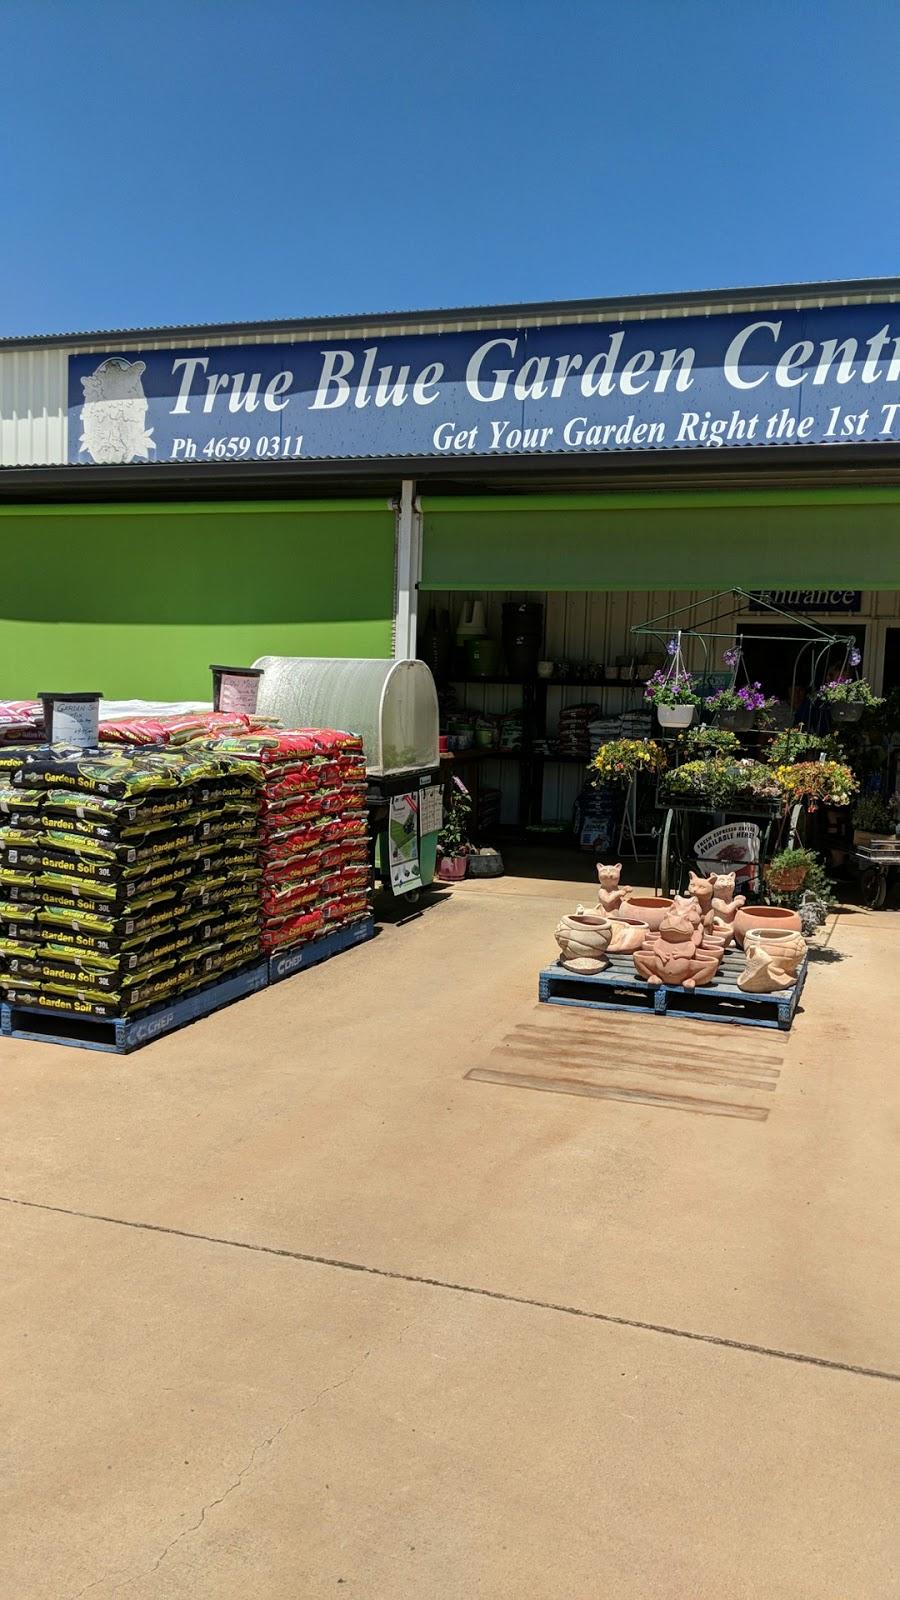 True Blue Garden Centre - Store | 127 Hursley Rd, Toowoomba